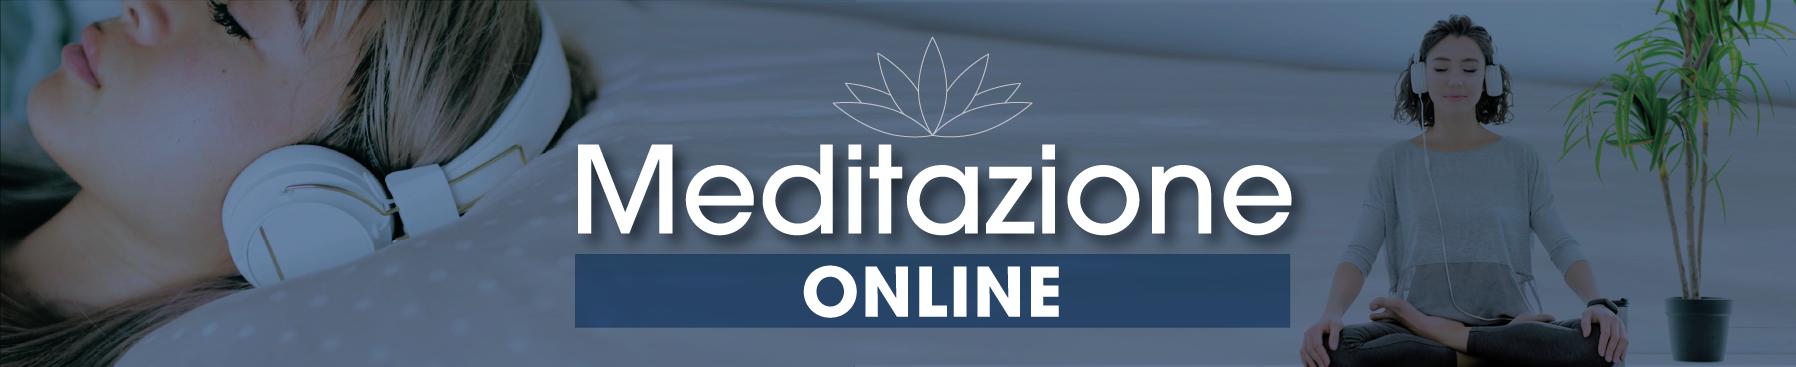 https://meditaedanza.com/wp-content/uploads/2020/12/meditazione-online-header.png